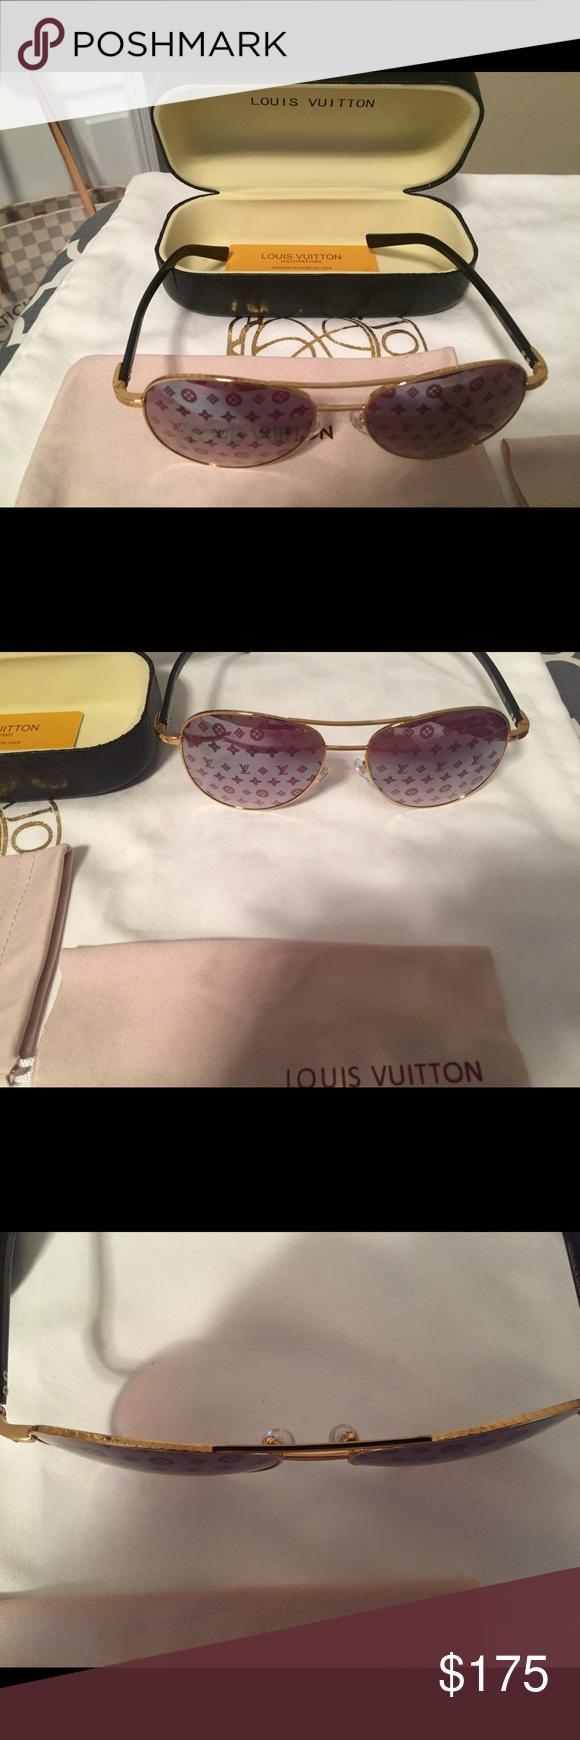 a44b87db323 Louis Vuitton sunglasses Louis Vuitton sunglasses unisex... limited  edition.. 🔥💯 Louis Vuitton Accessories Sunglasses